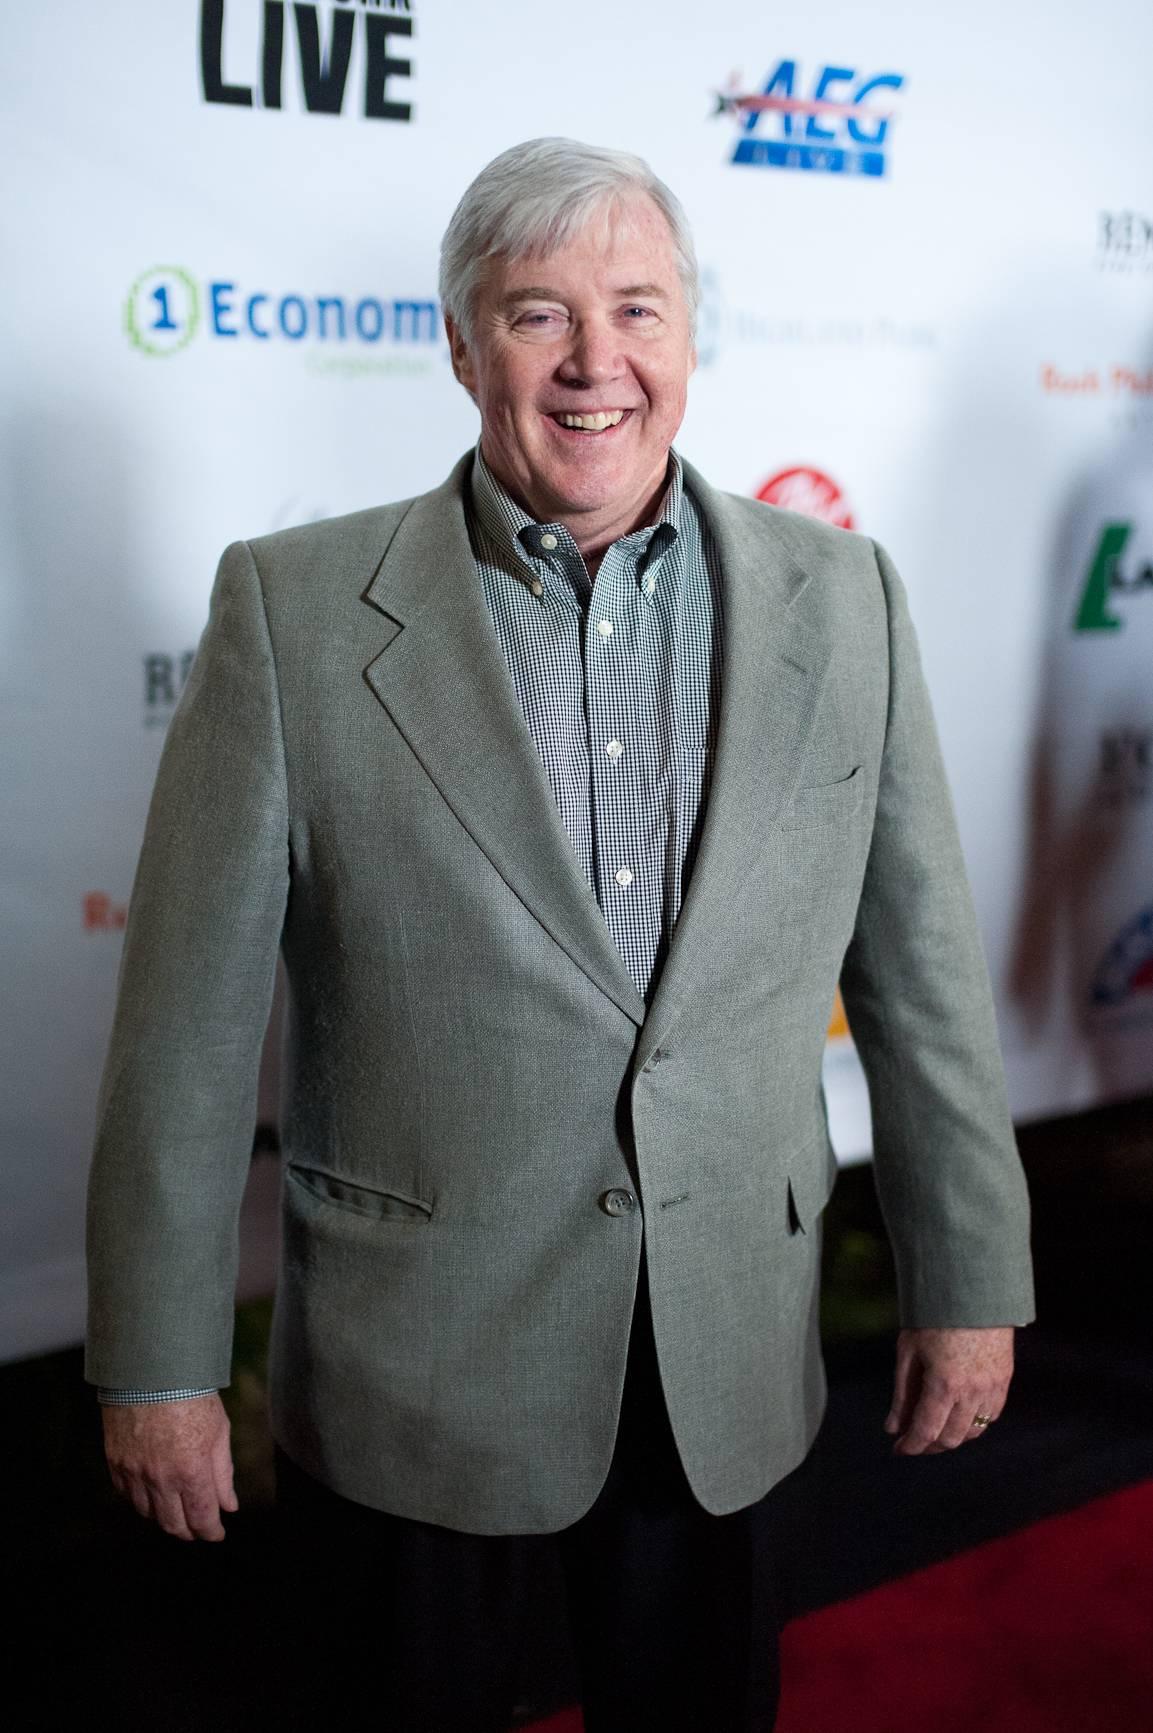 John Rubey, President AEG Network